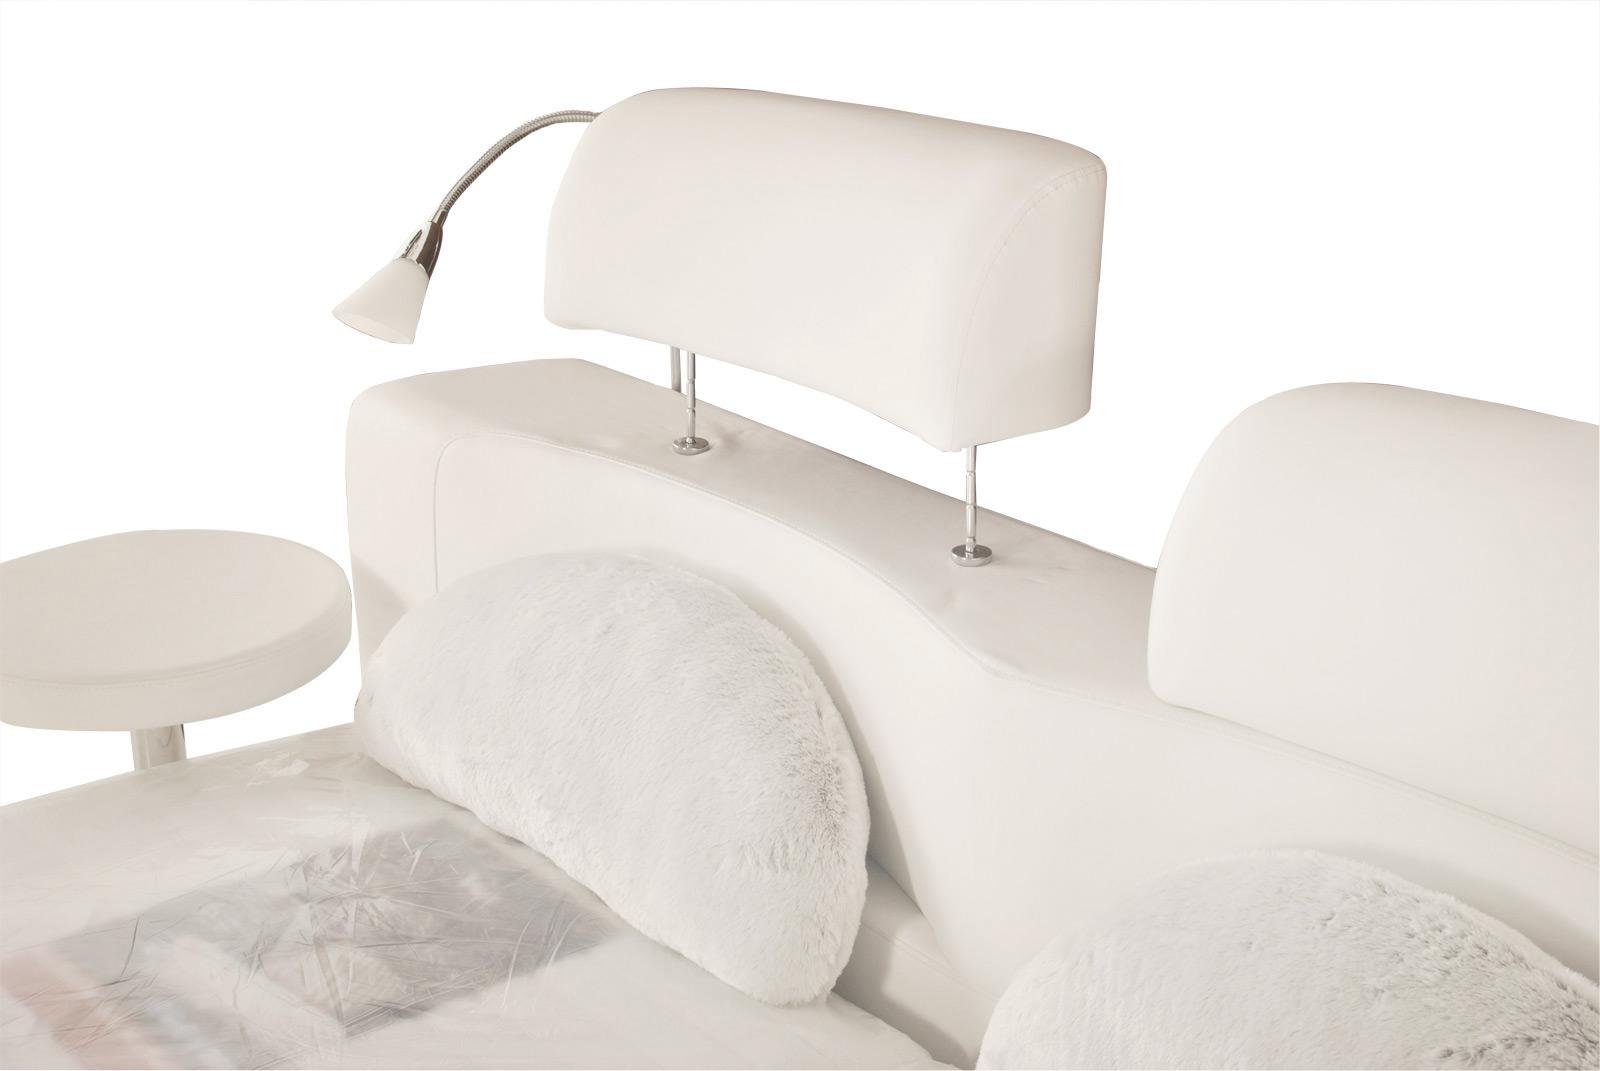 sam rundbett doppelbett 180 x 200 cm 2 leselampen wei. Black Bedroom Furniture Sets. Home Design Ideas